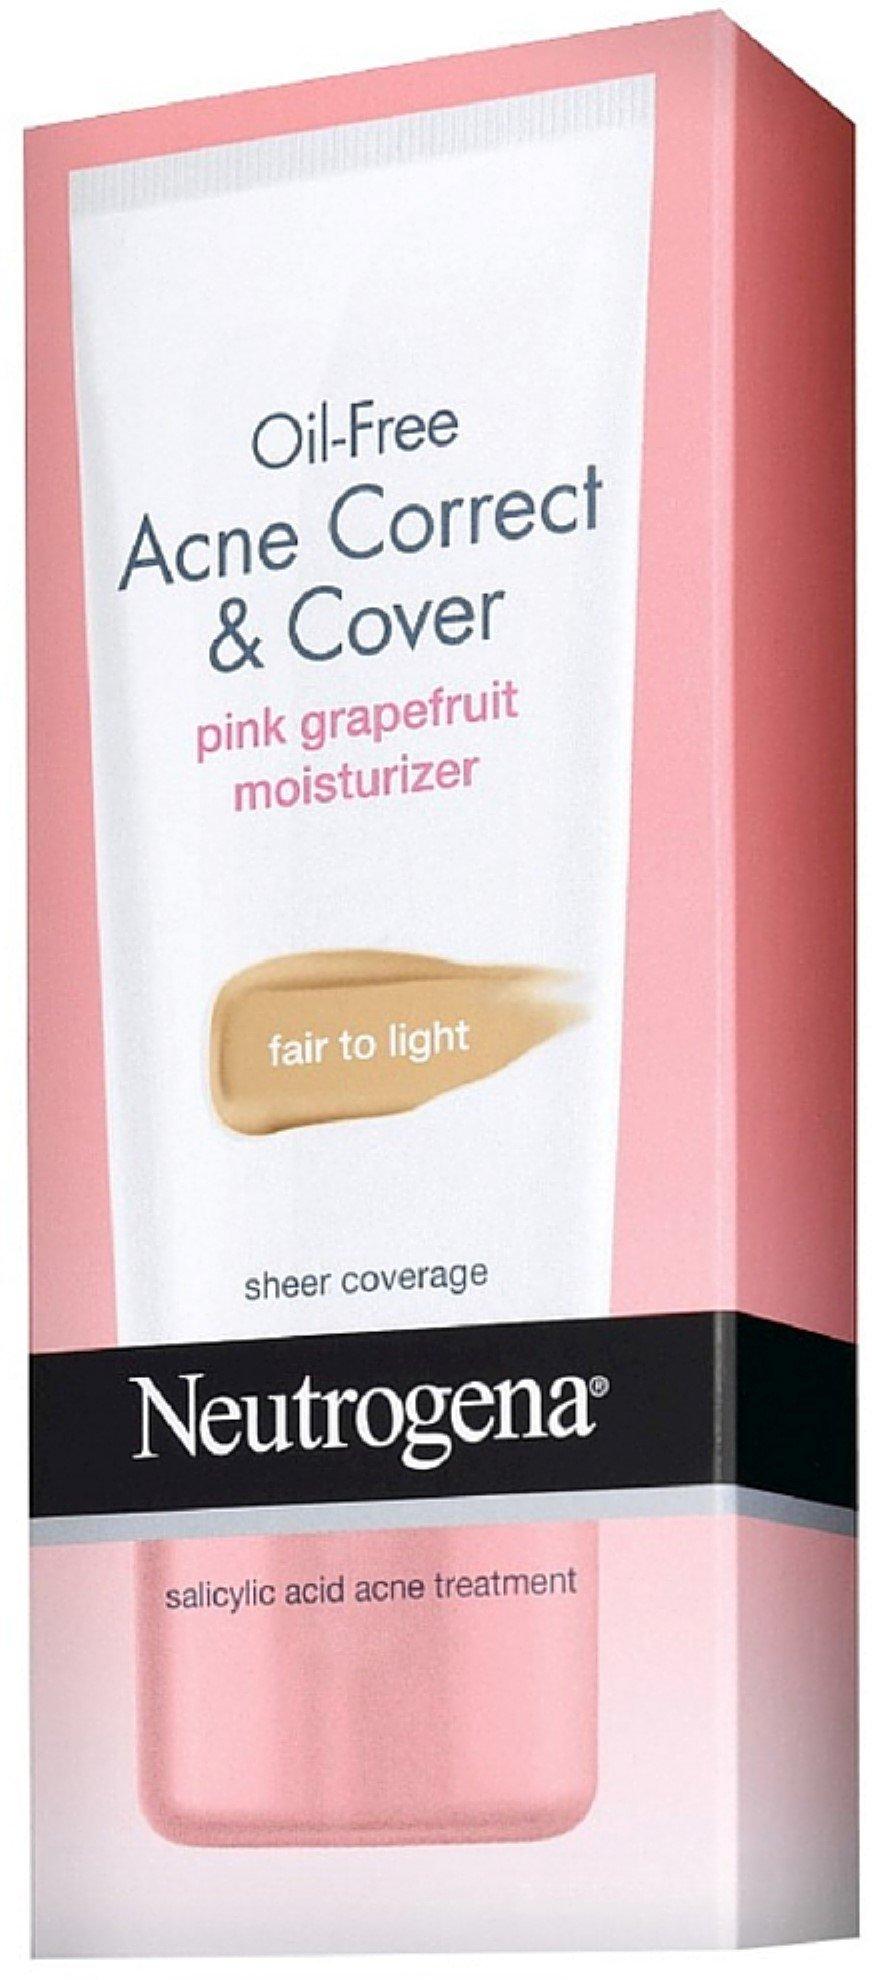 Neutrogena Oil-Free Acne Correct & Cover Pink Grapefruit Moisturizer, Fair to Light 1.7 oz (10 Pack)